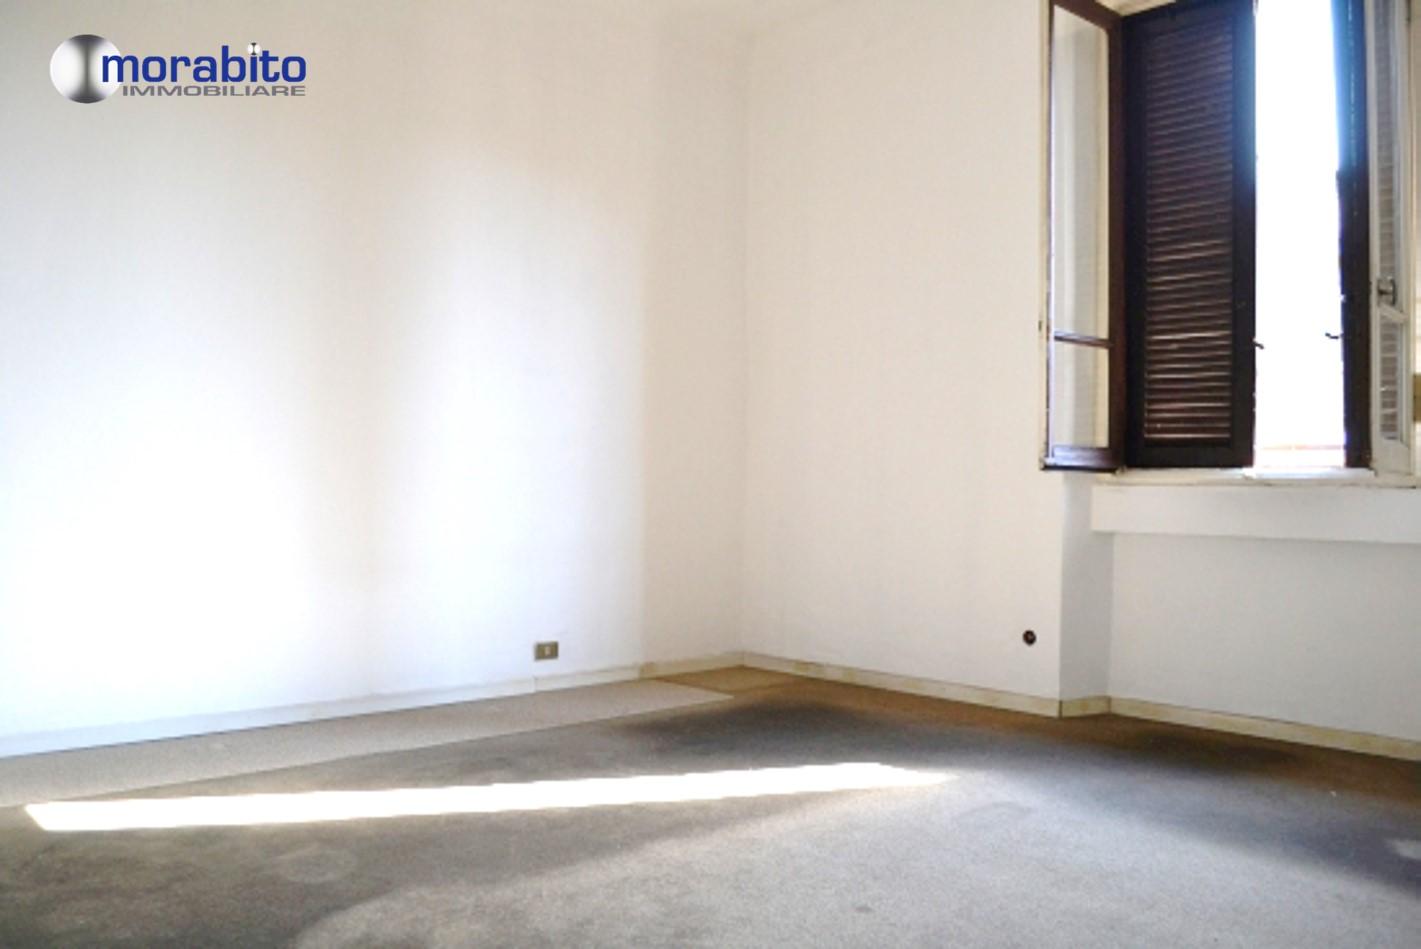 Bilocale Milano Viale Carlo Espinasse 5